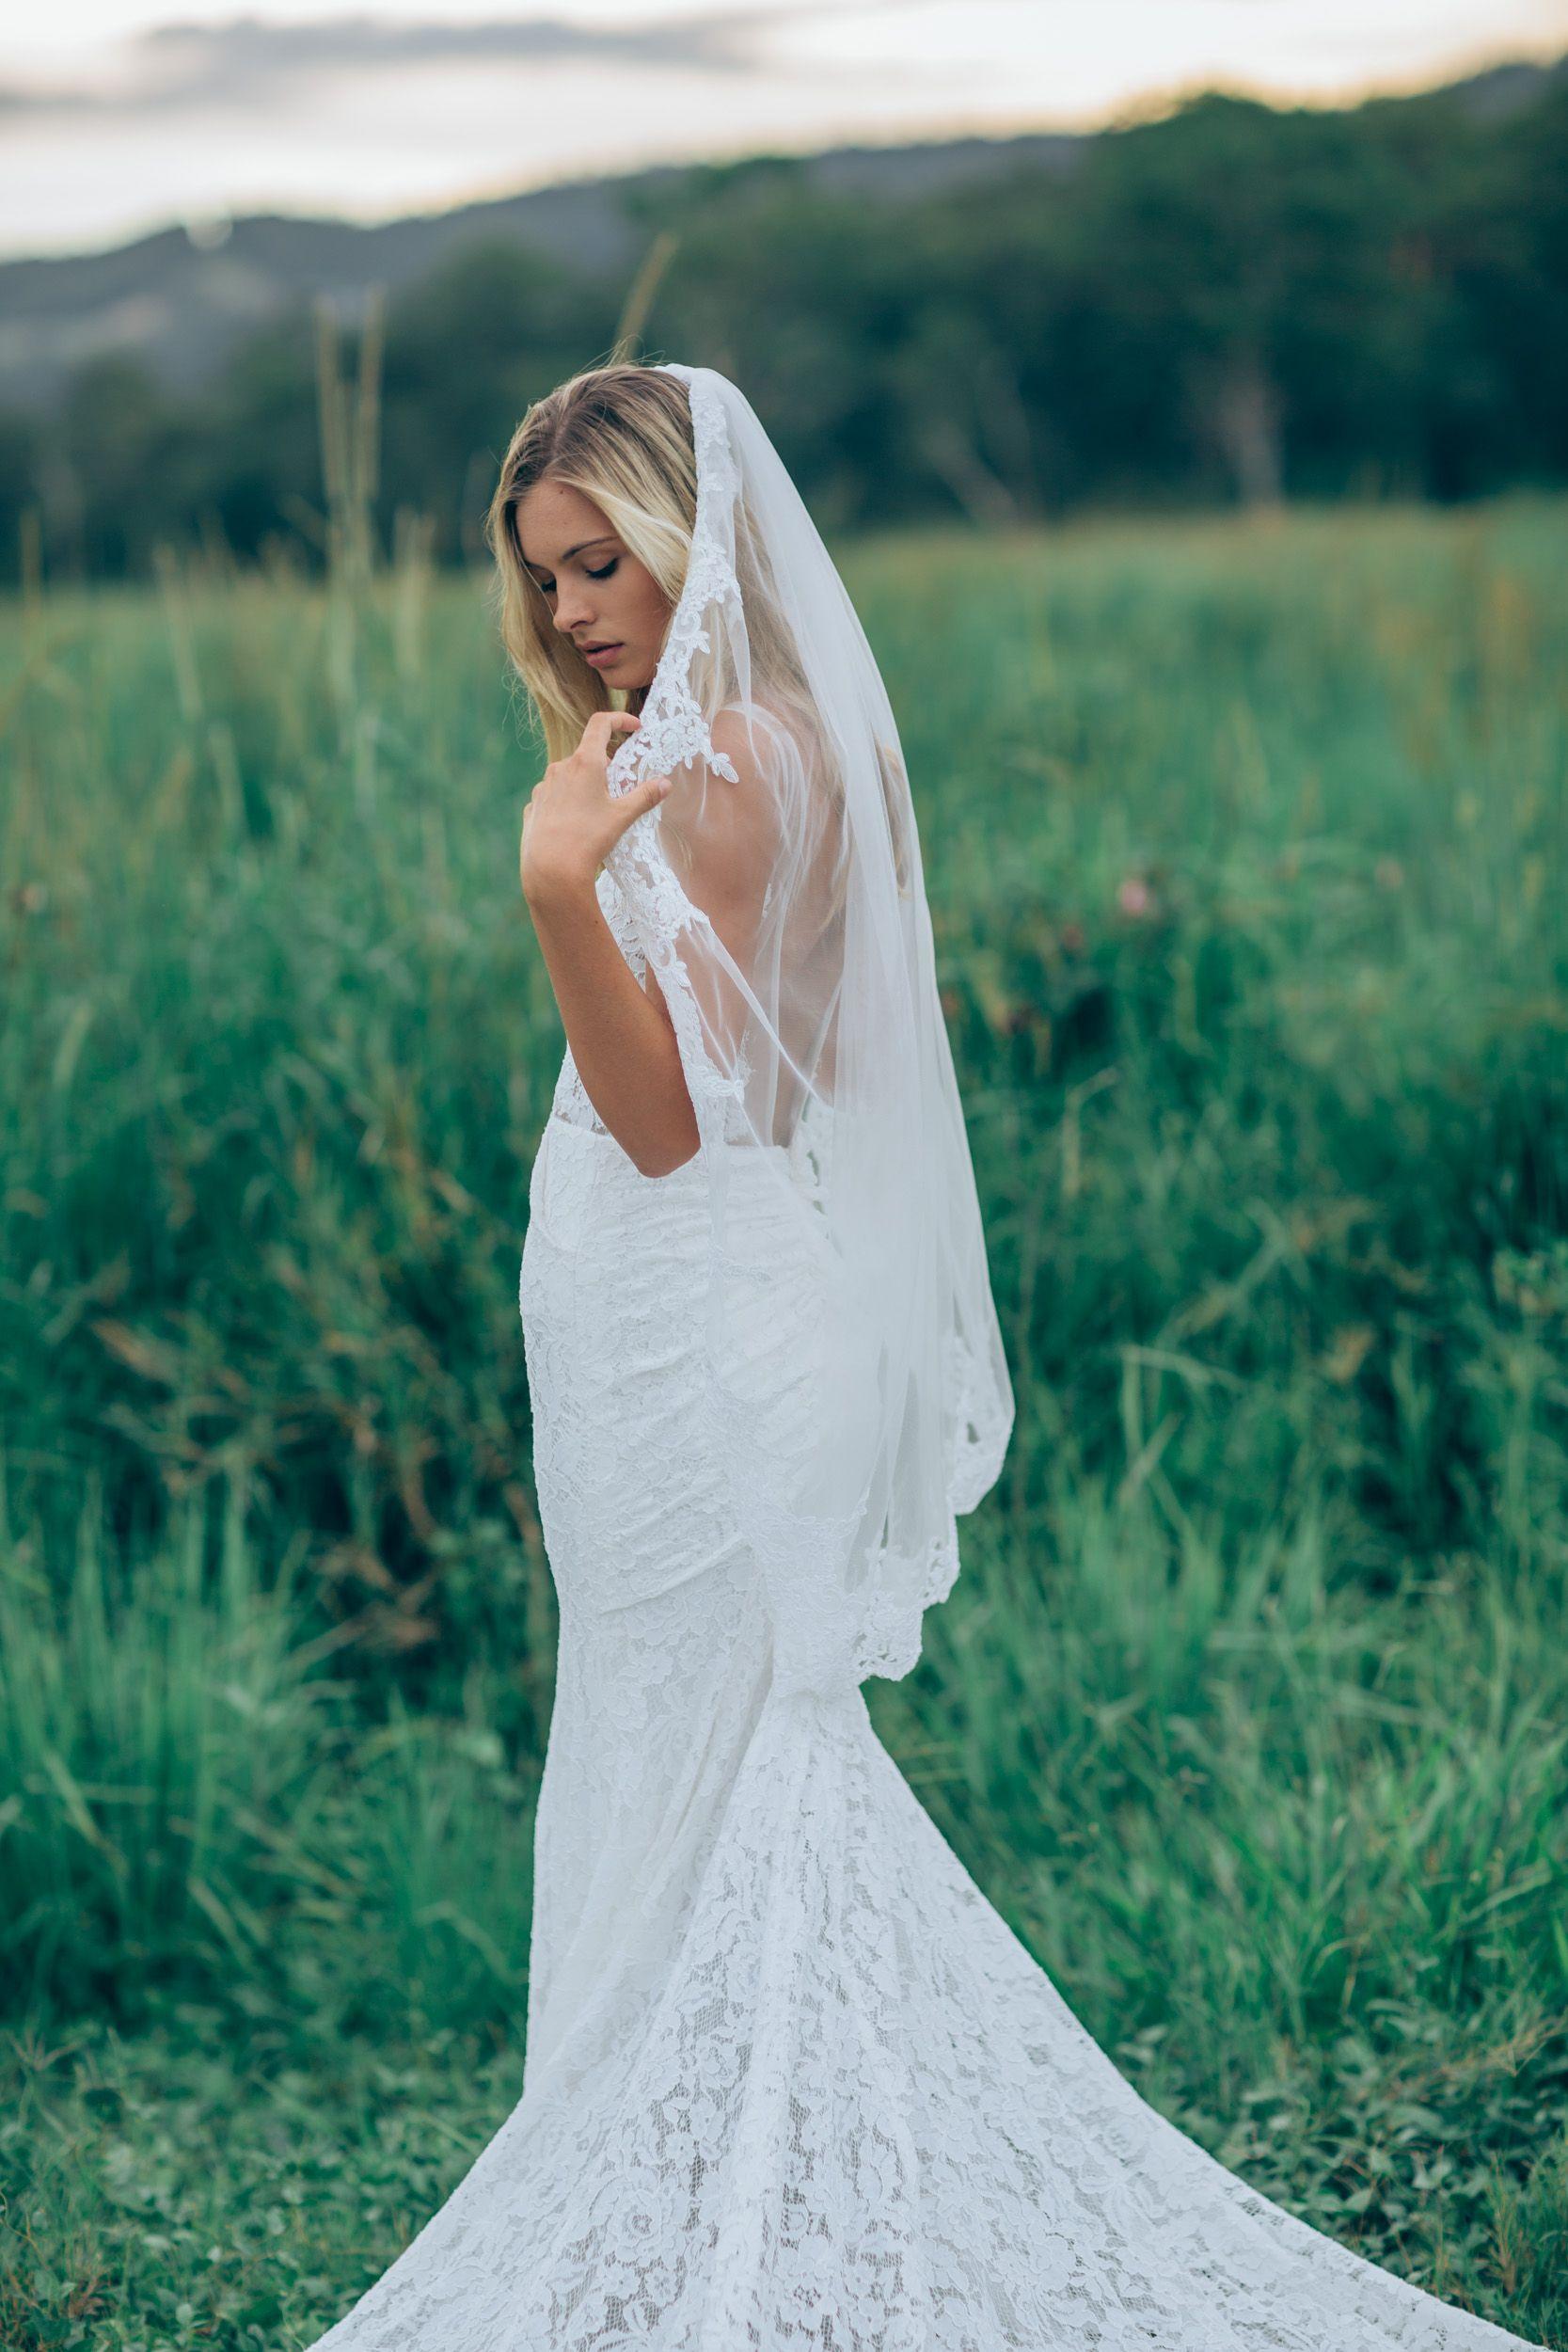 Low back wedding dress #Frankie http://www.madewithlovebridal.com ...